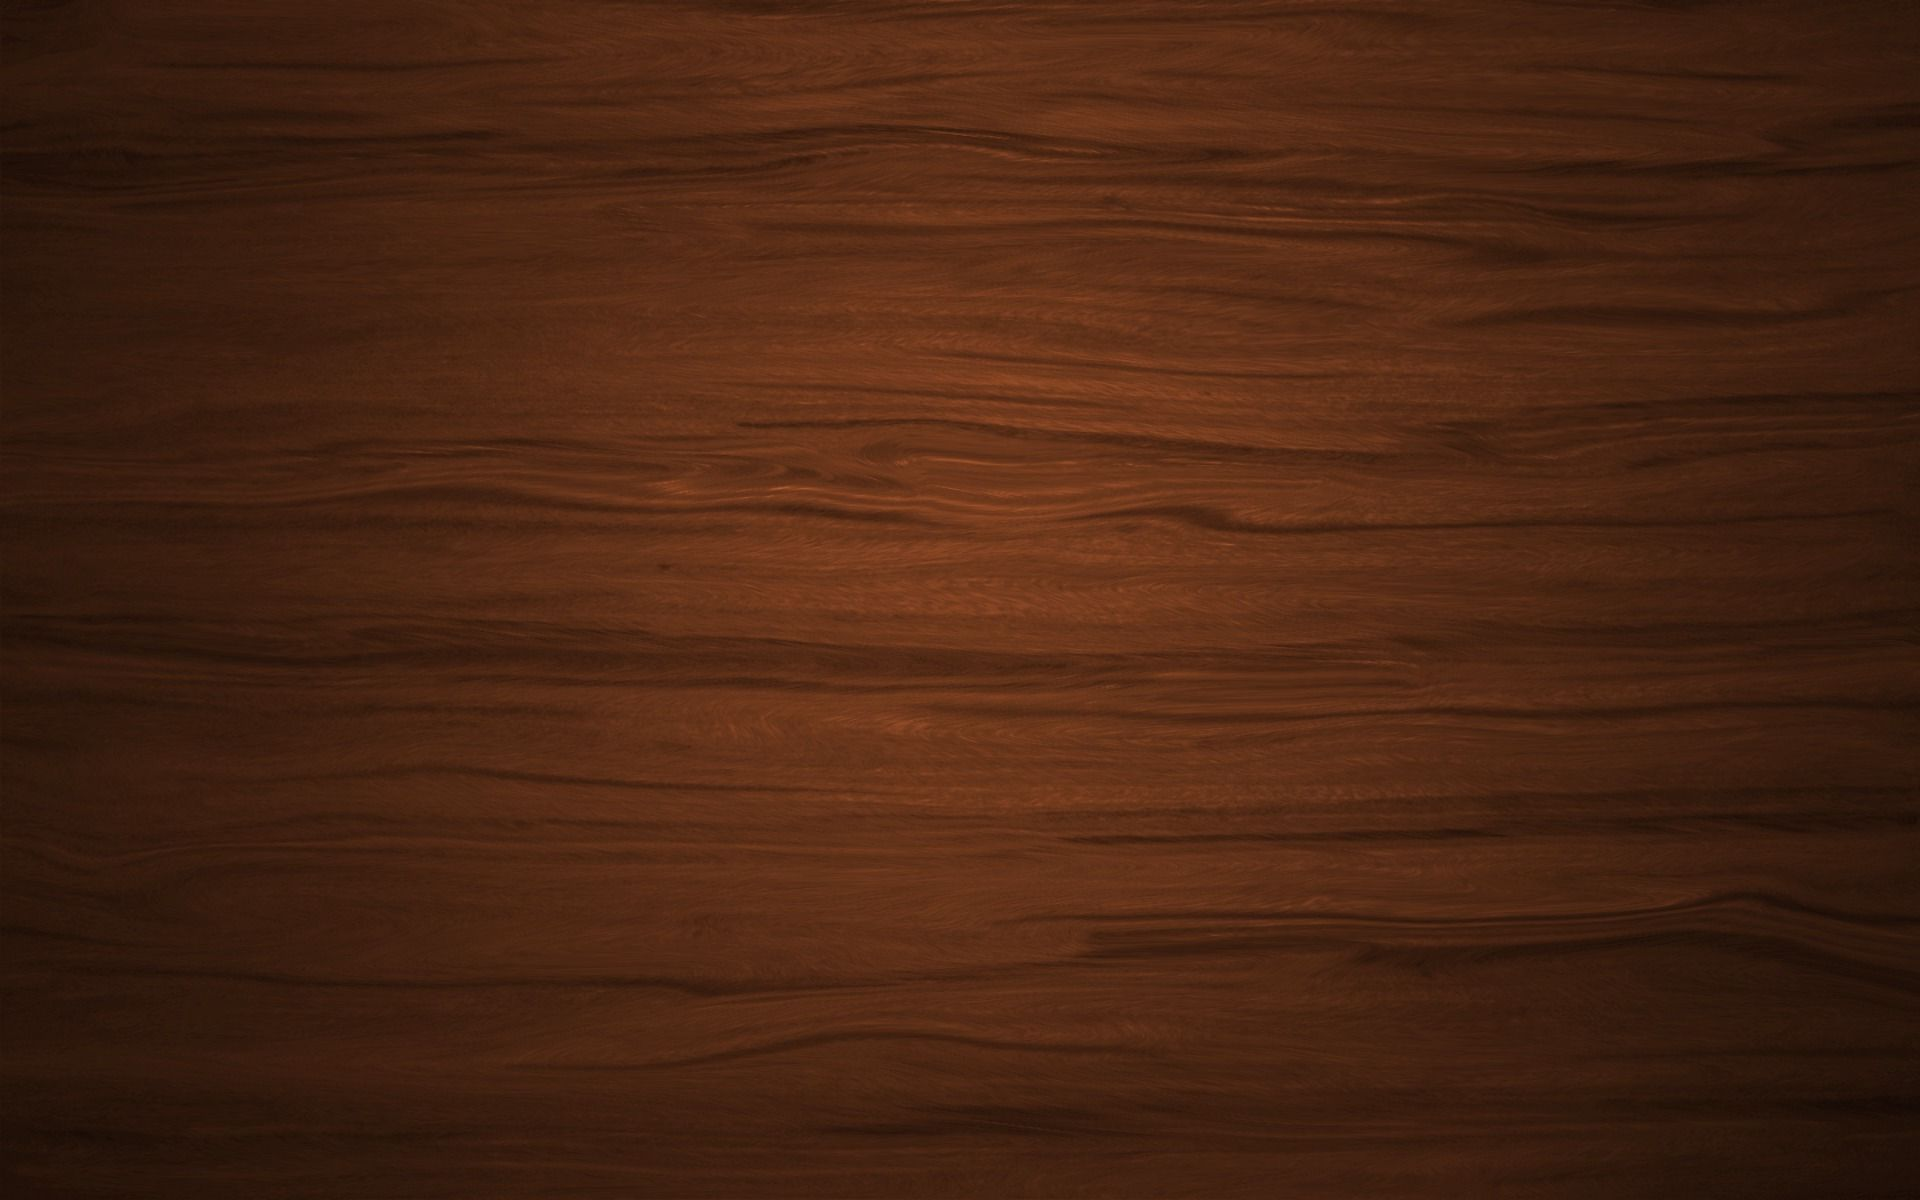 wood texture 질감